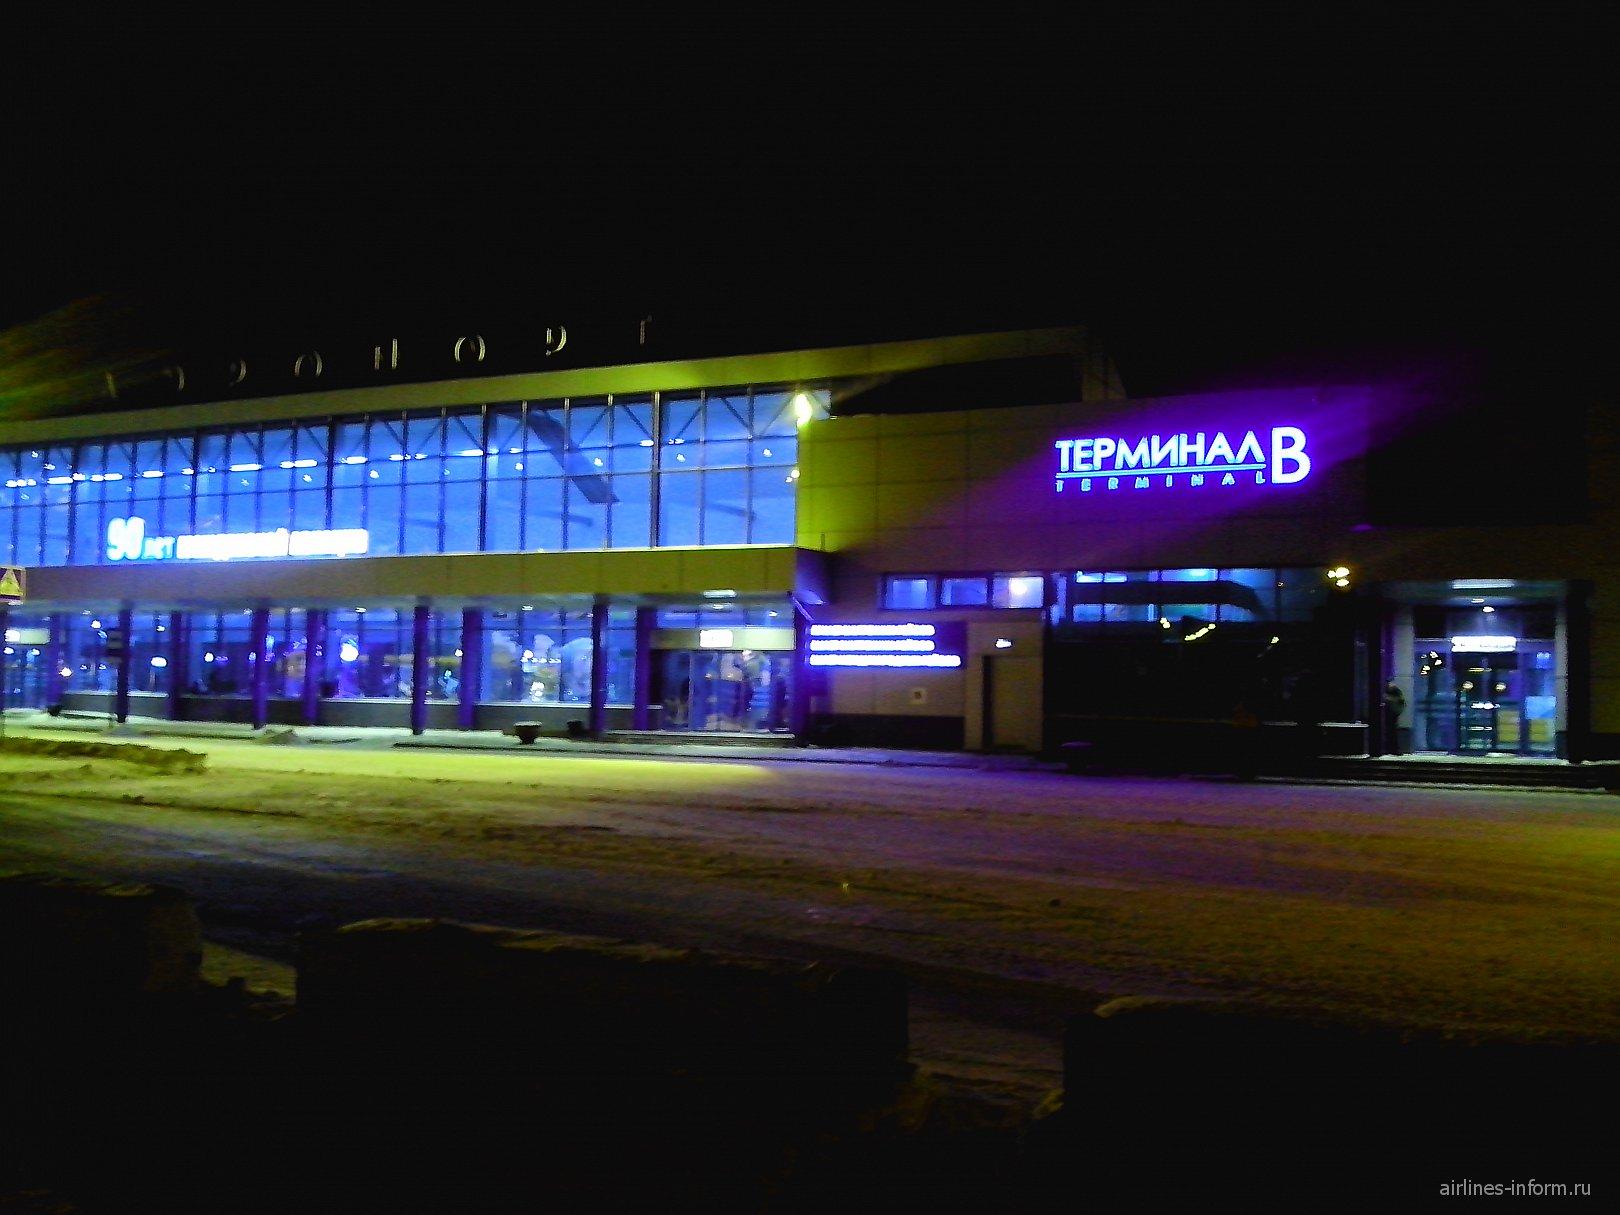 Перелёт Омск-Москва-Владивосток-Москва-Омск. Часть первая: Аэрофлот, Омск-Москва